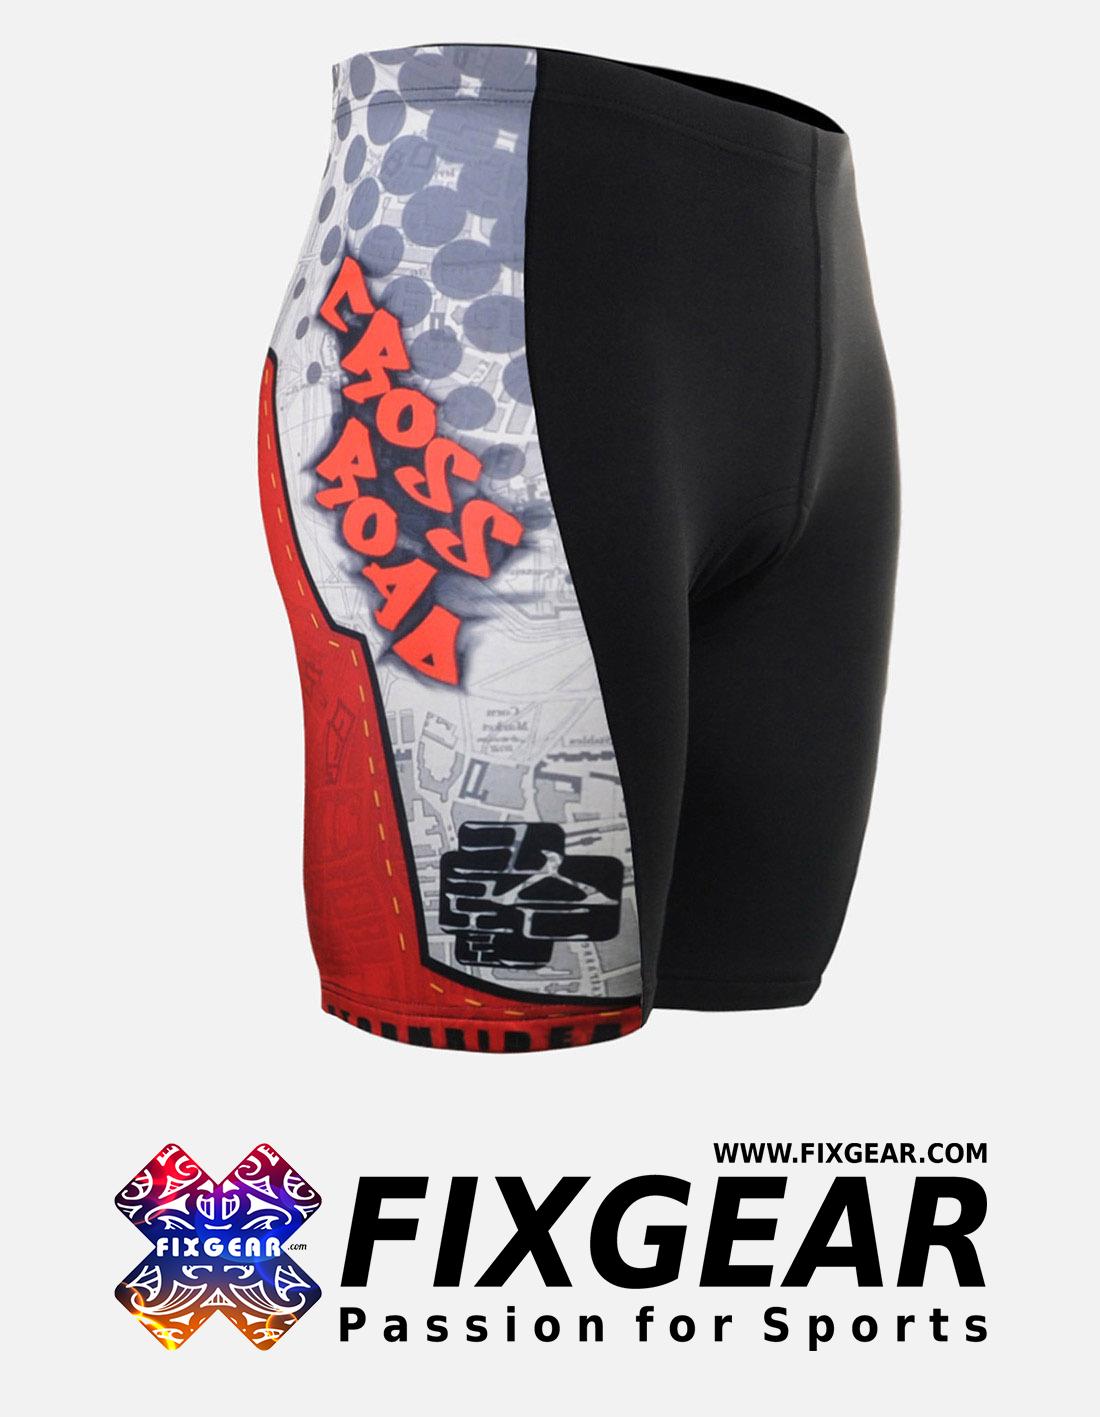 FIXGEAR ST-W5 Women's Cycling Padded Shorts